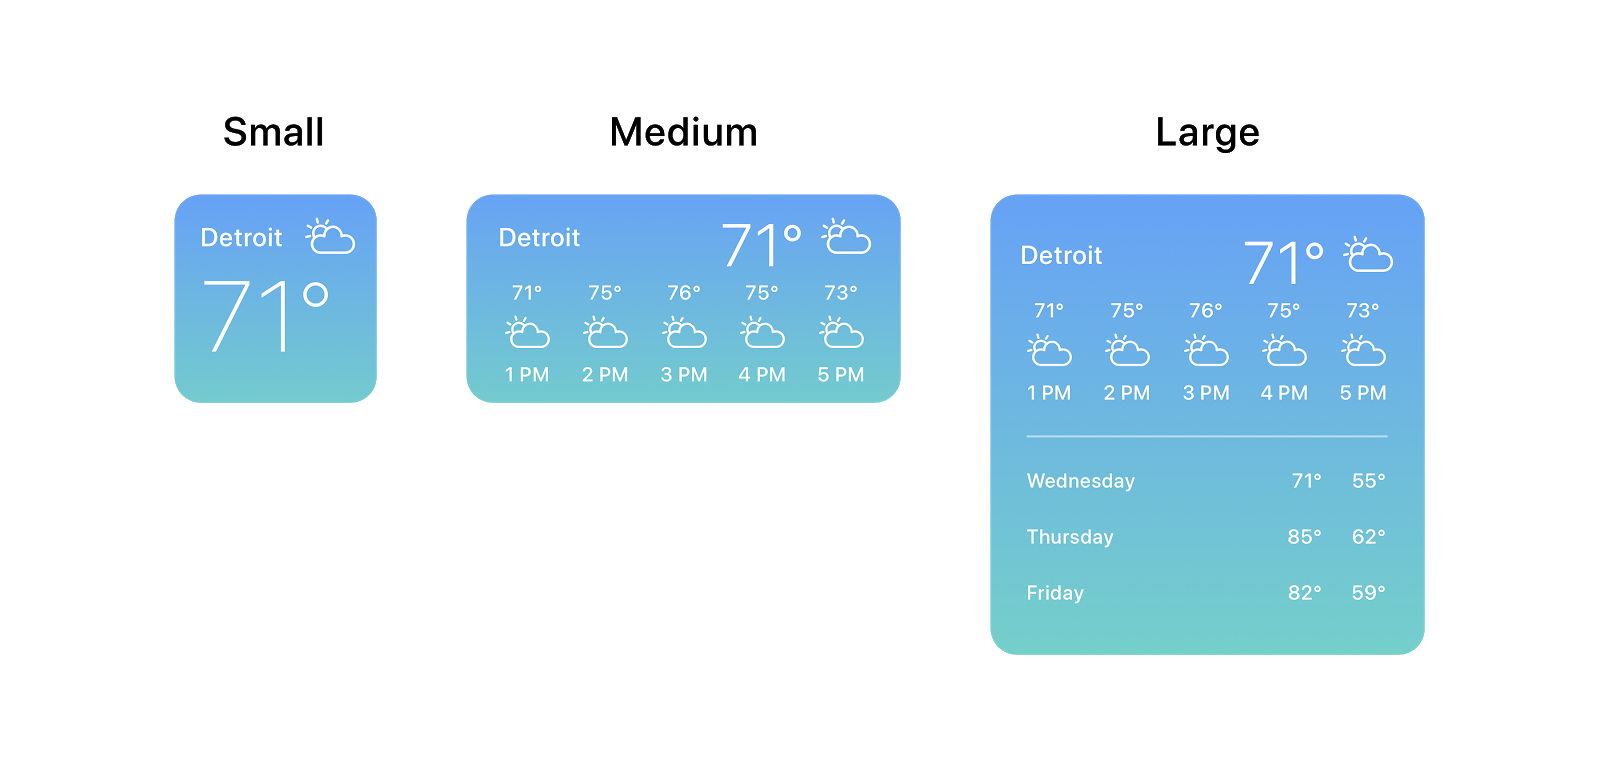 widgets image 1